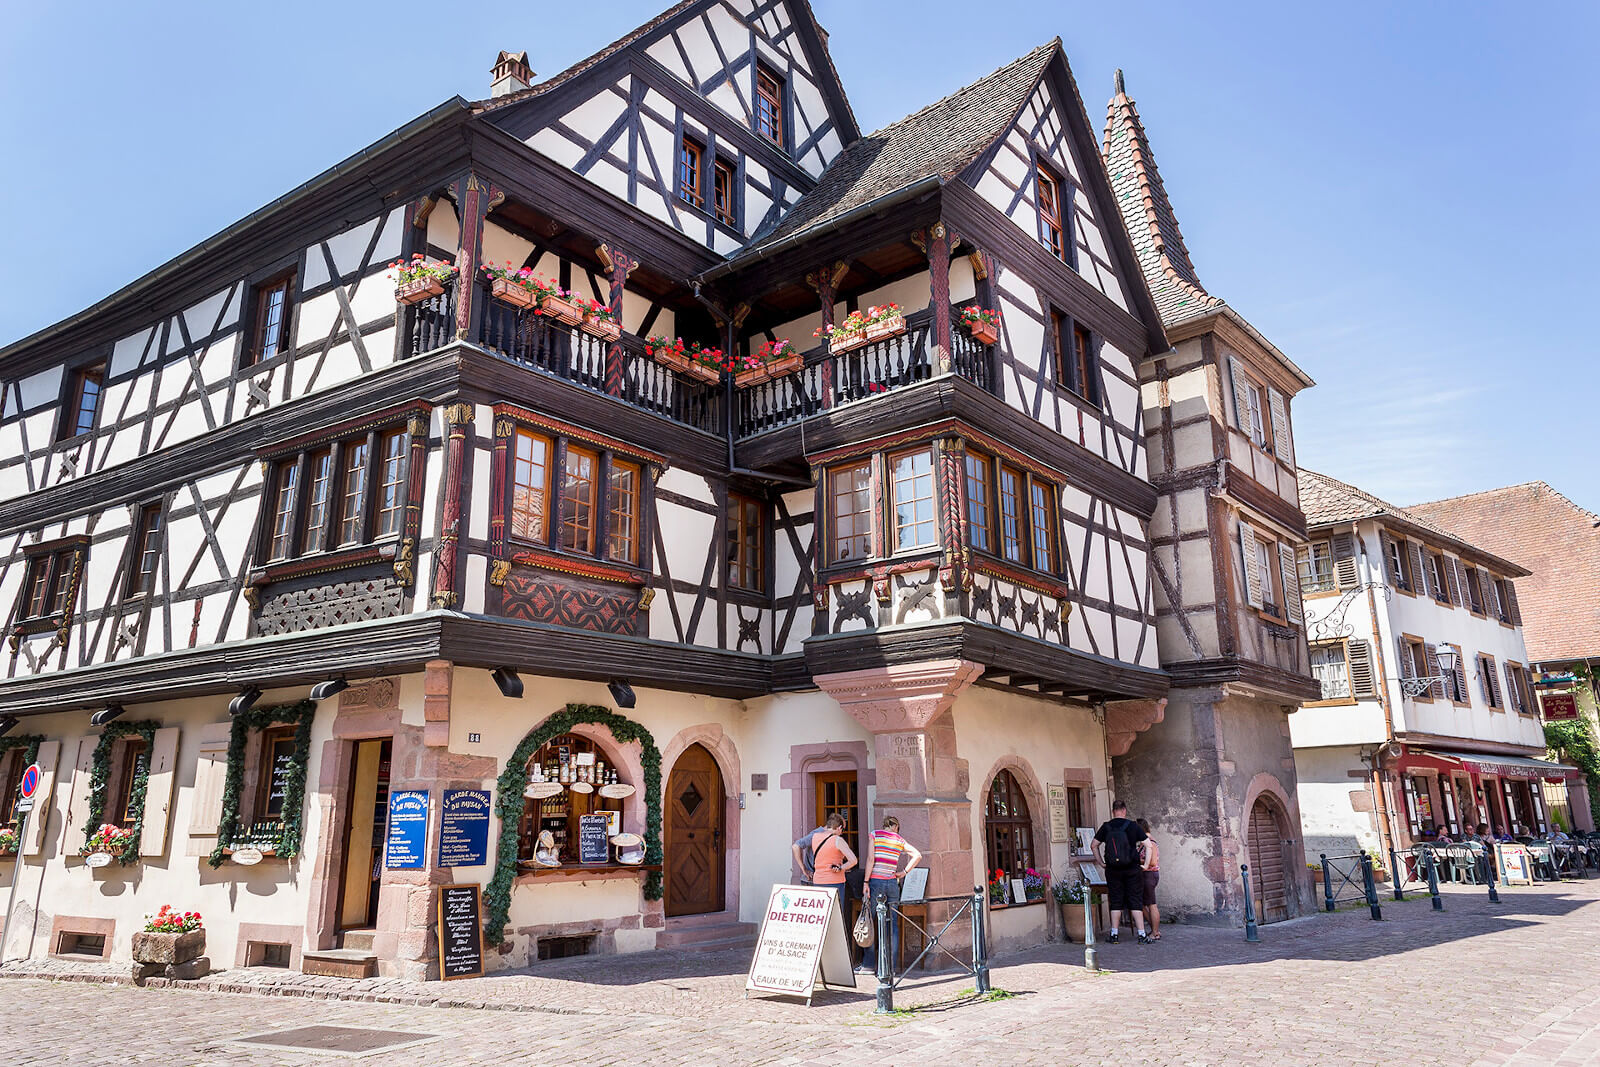 H tel de ville de kaysersberg kaysersberg vignoble for Hotels kaysersberg